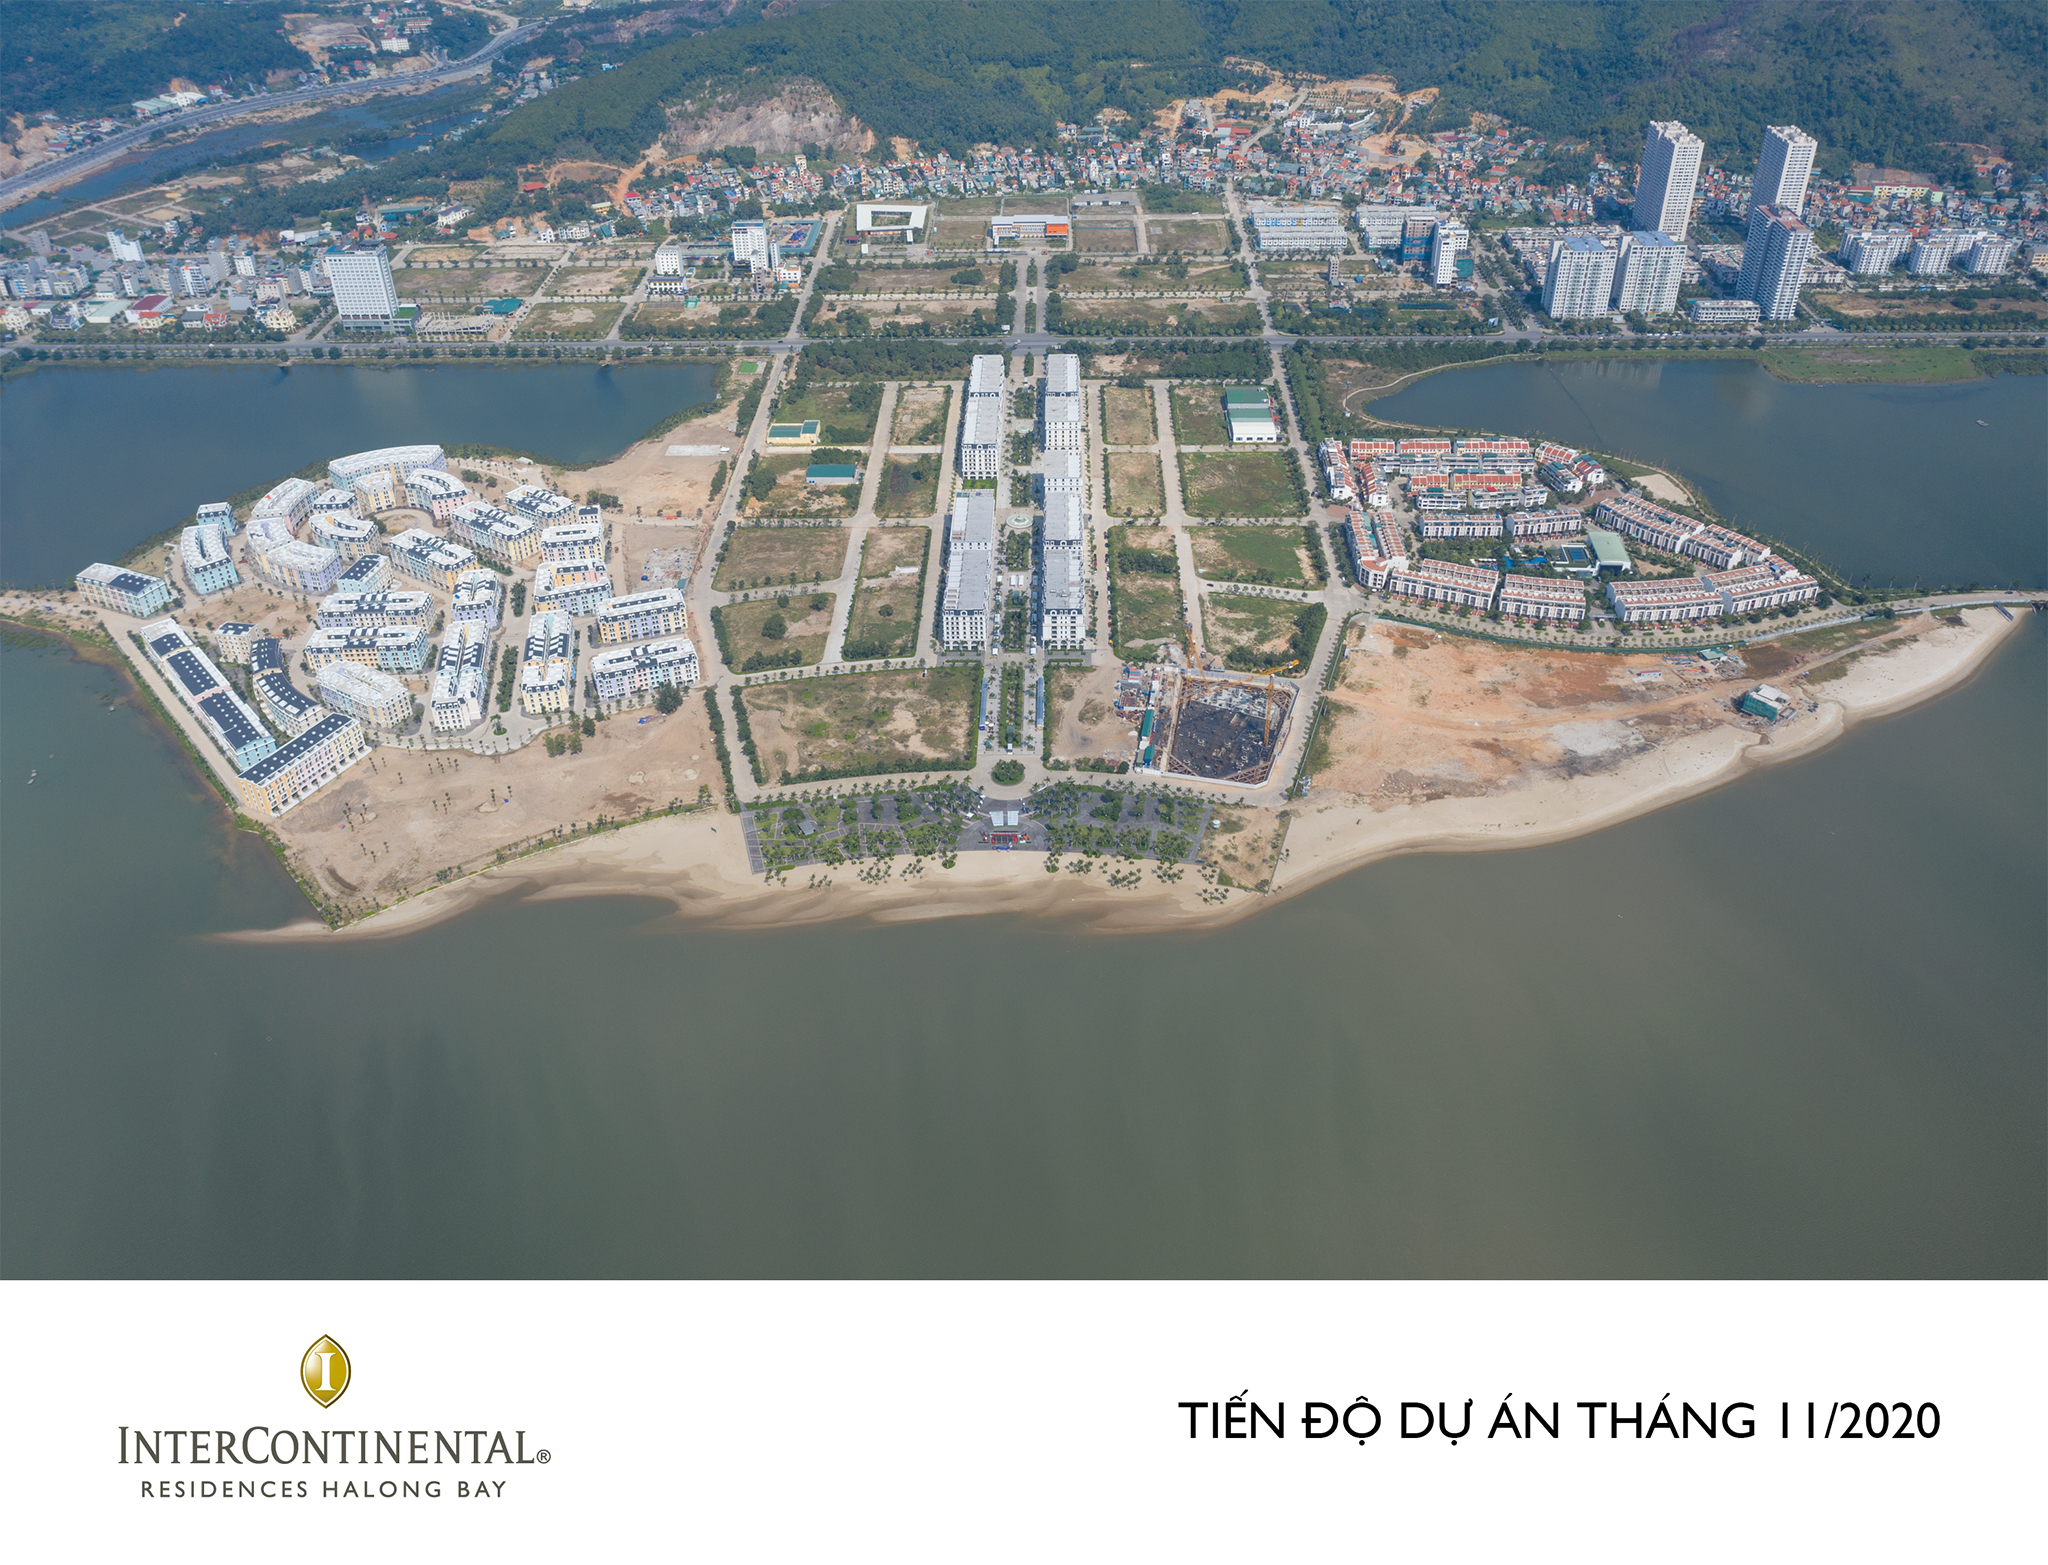 Tien do InterContinental Residences Halong Bay 11.2020 2